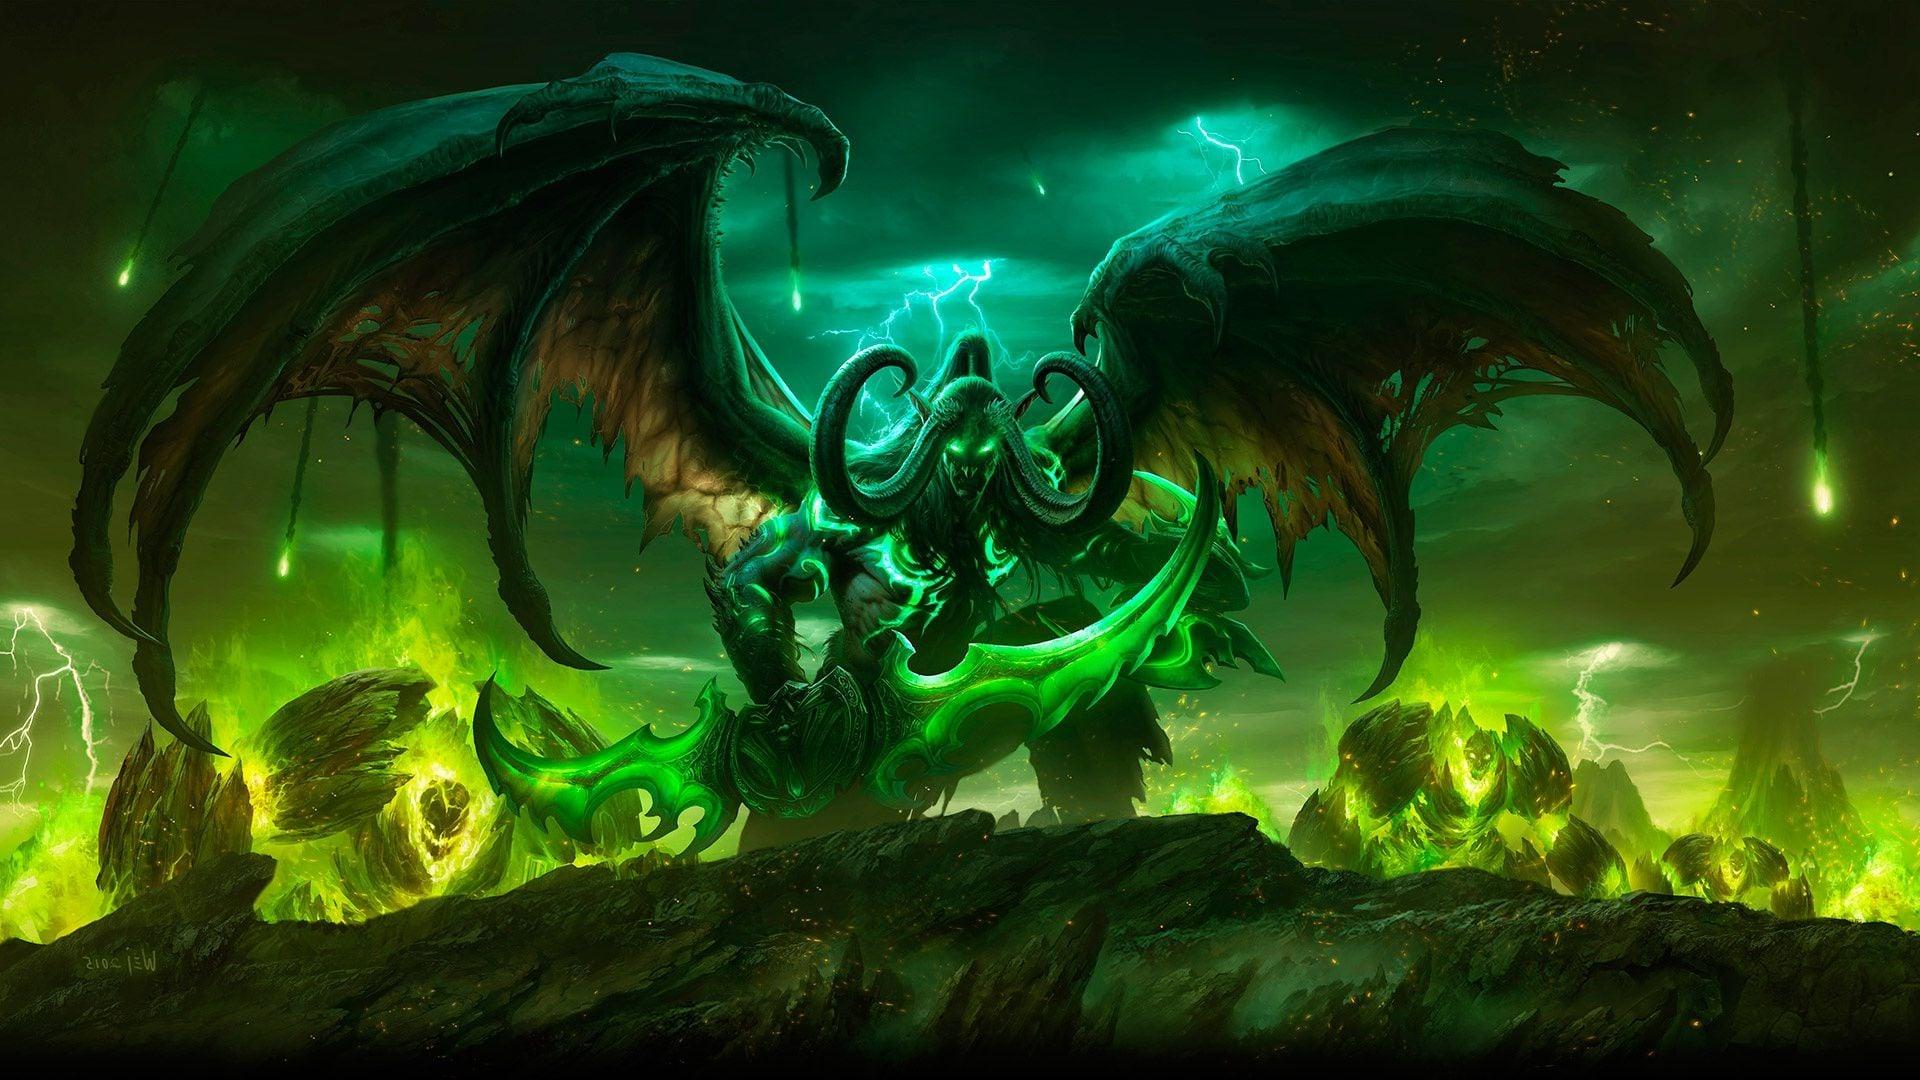 Zbogom Legion – U susret novoj World of Warcraft ekspanziji